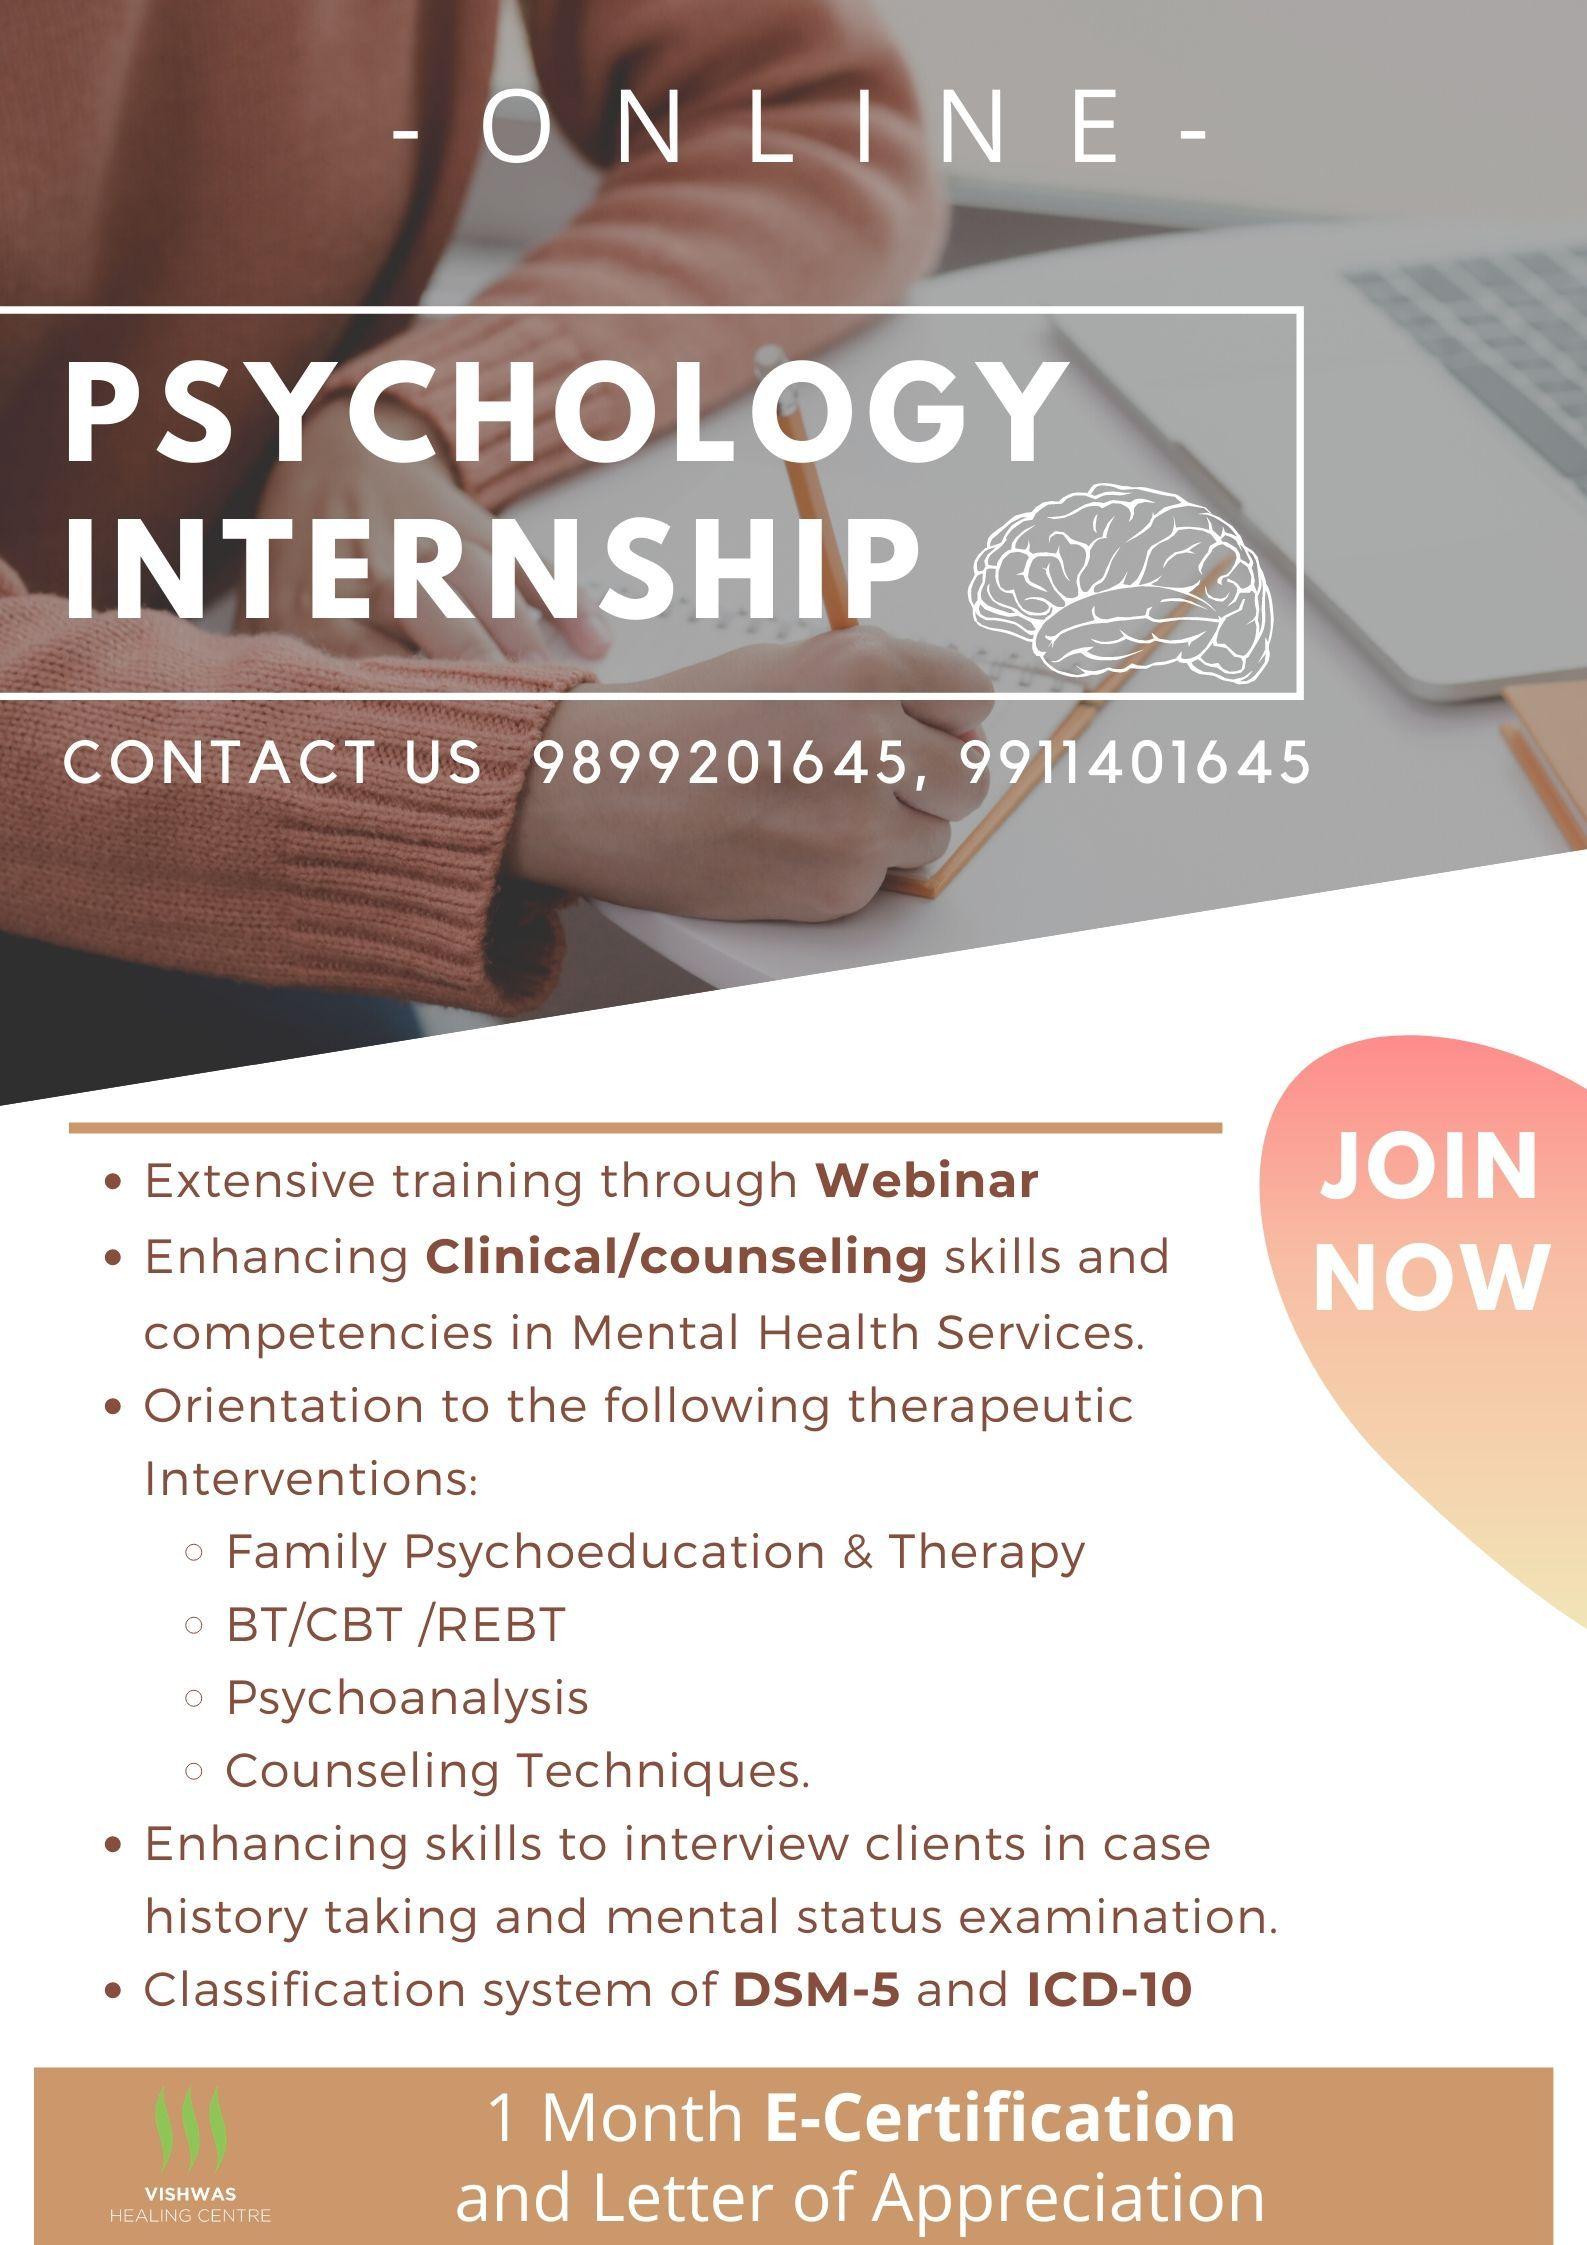 Online Psychology Internship In 2020 Psychology Internships Counseling Techniques Psychoeducation